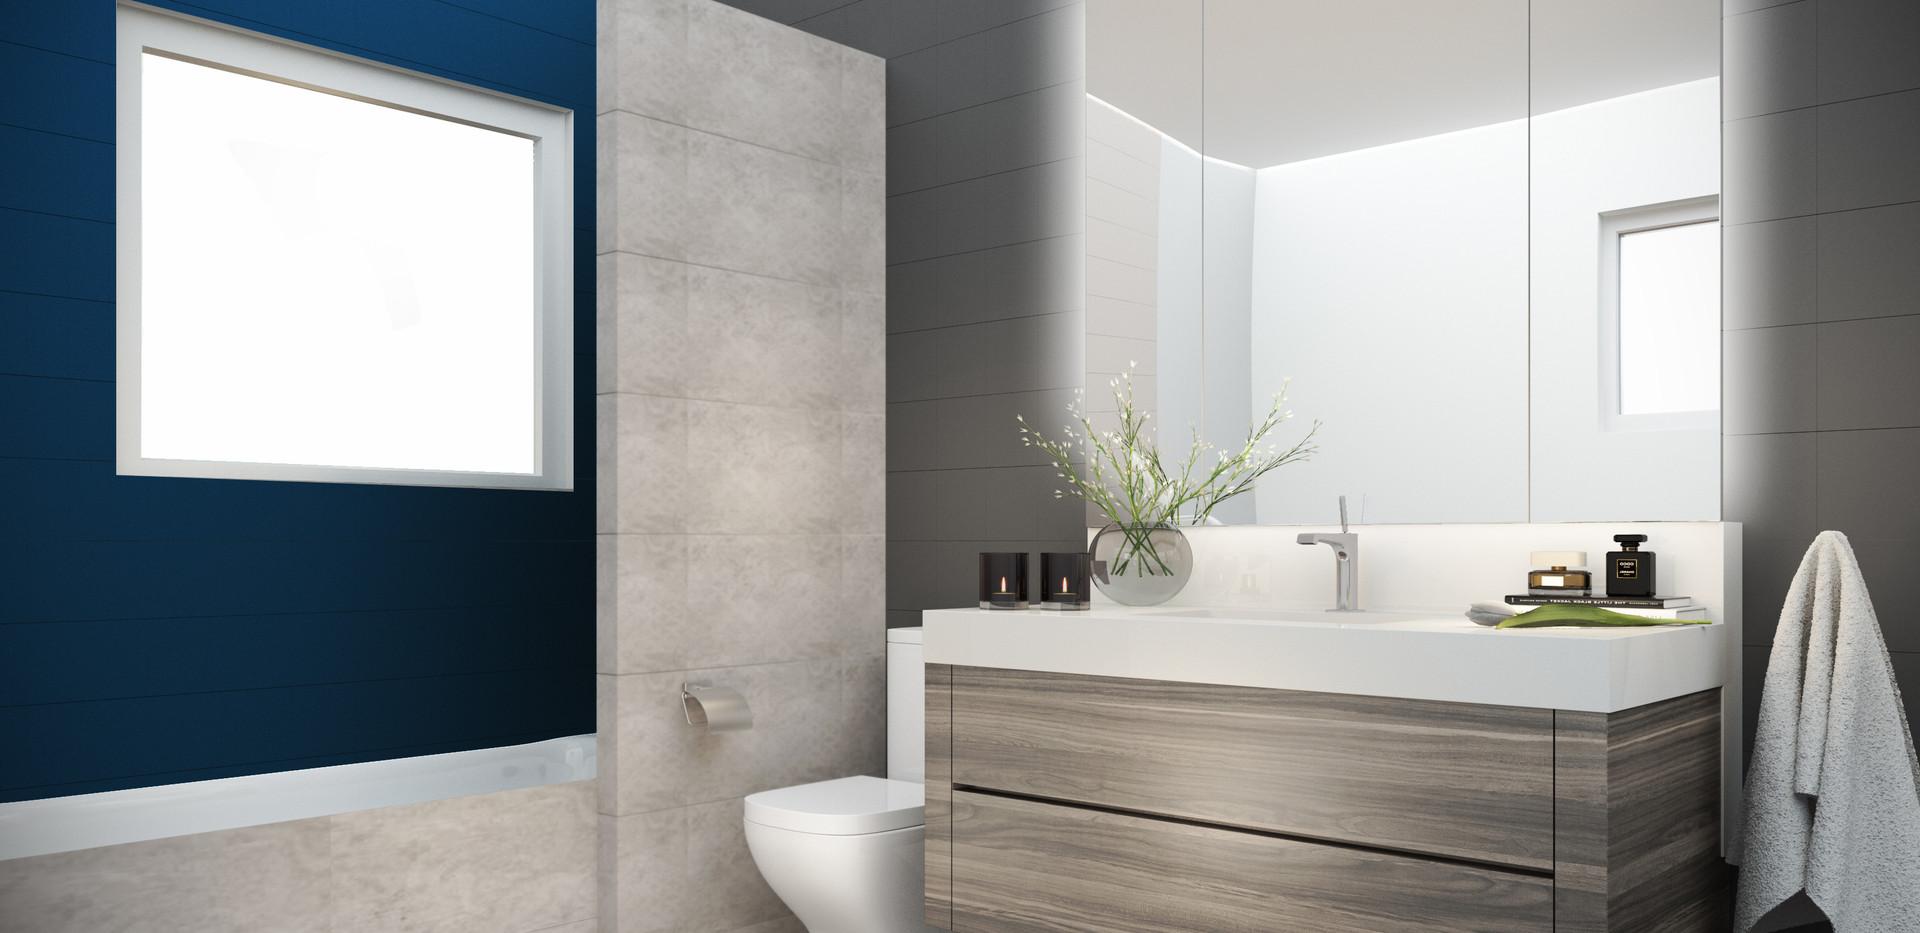 Eco2 Lodge_scheme-3 Bathroom.jpg